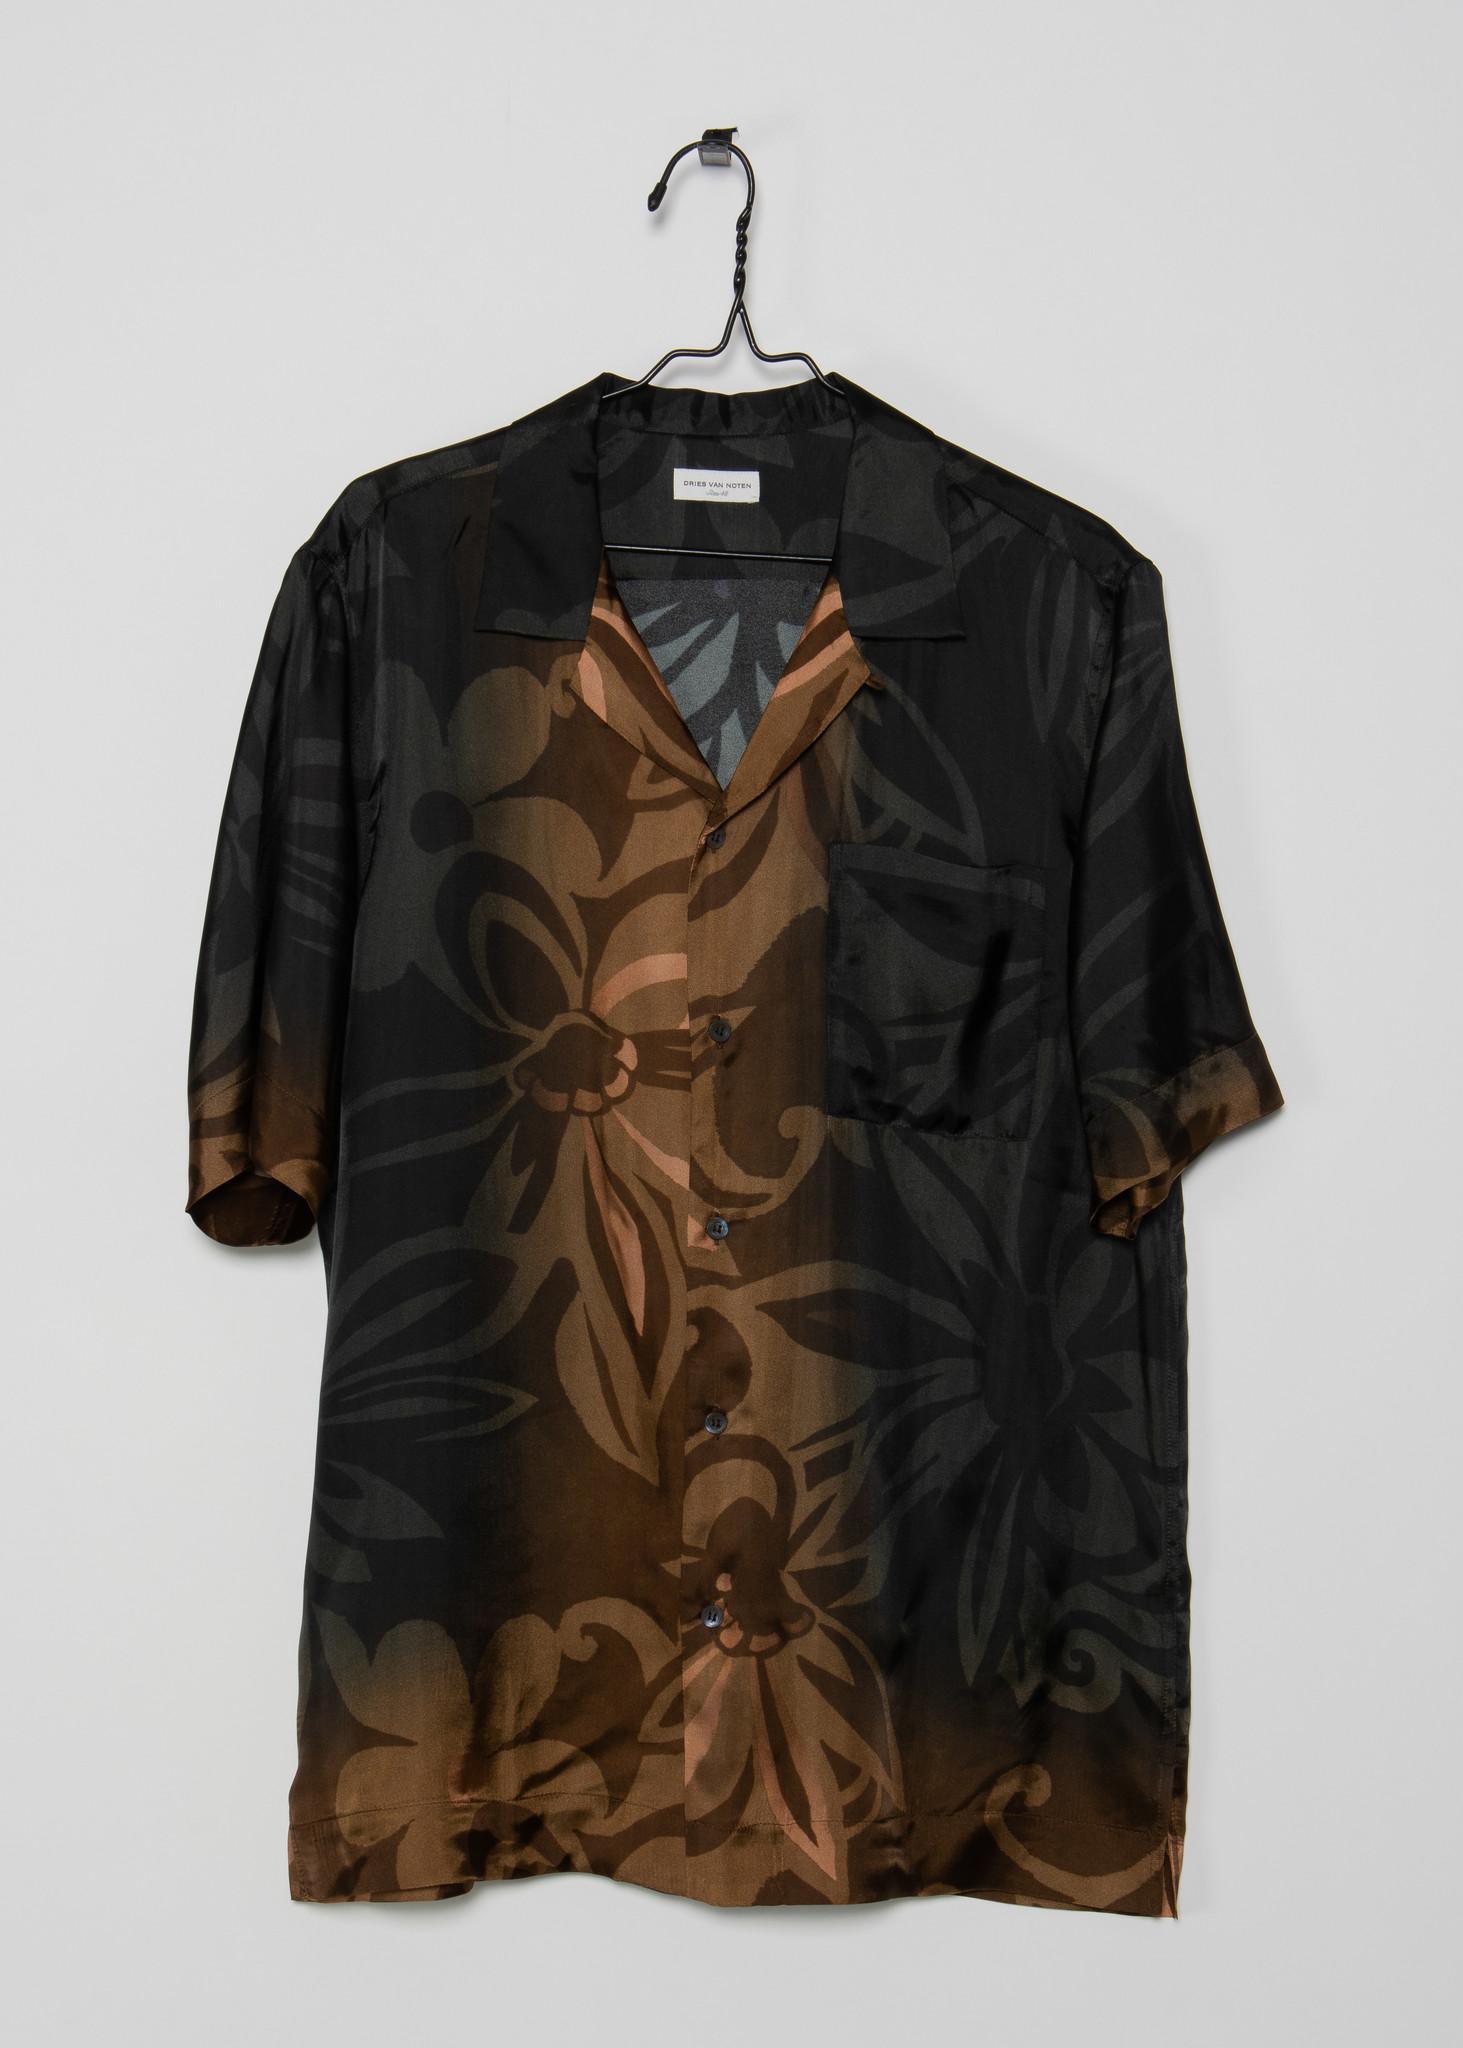 Black & Orange Floral Satin Shirt